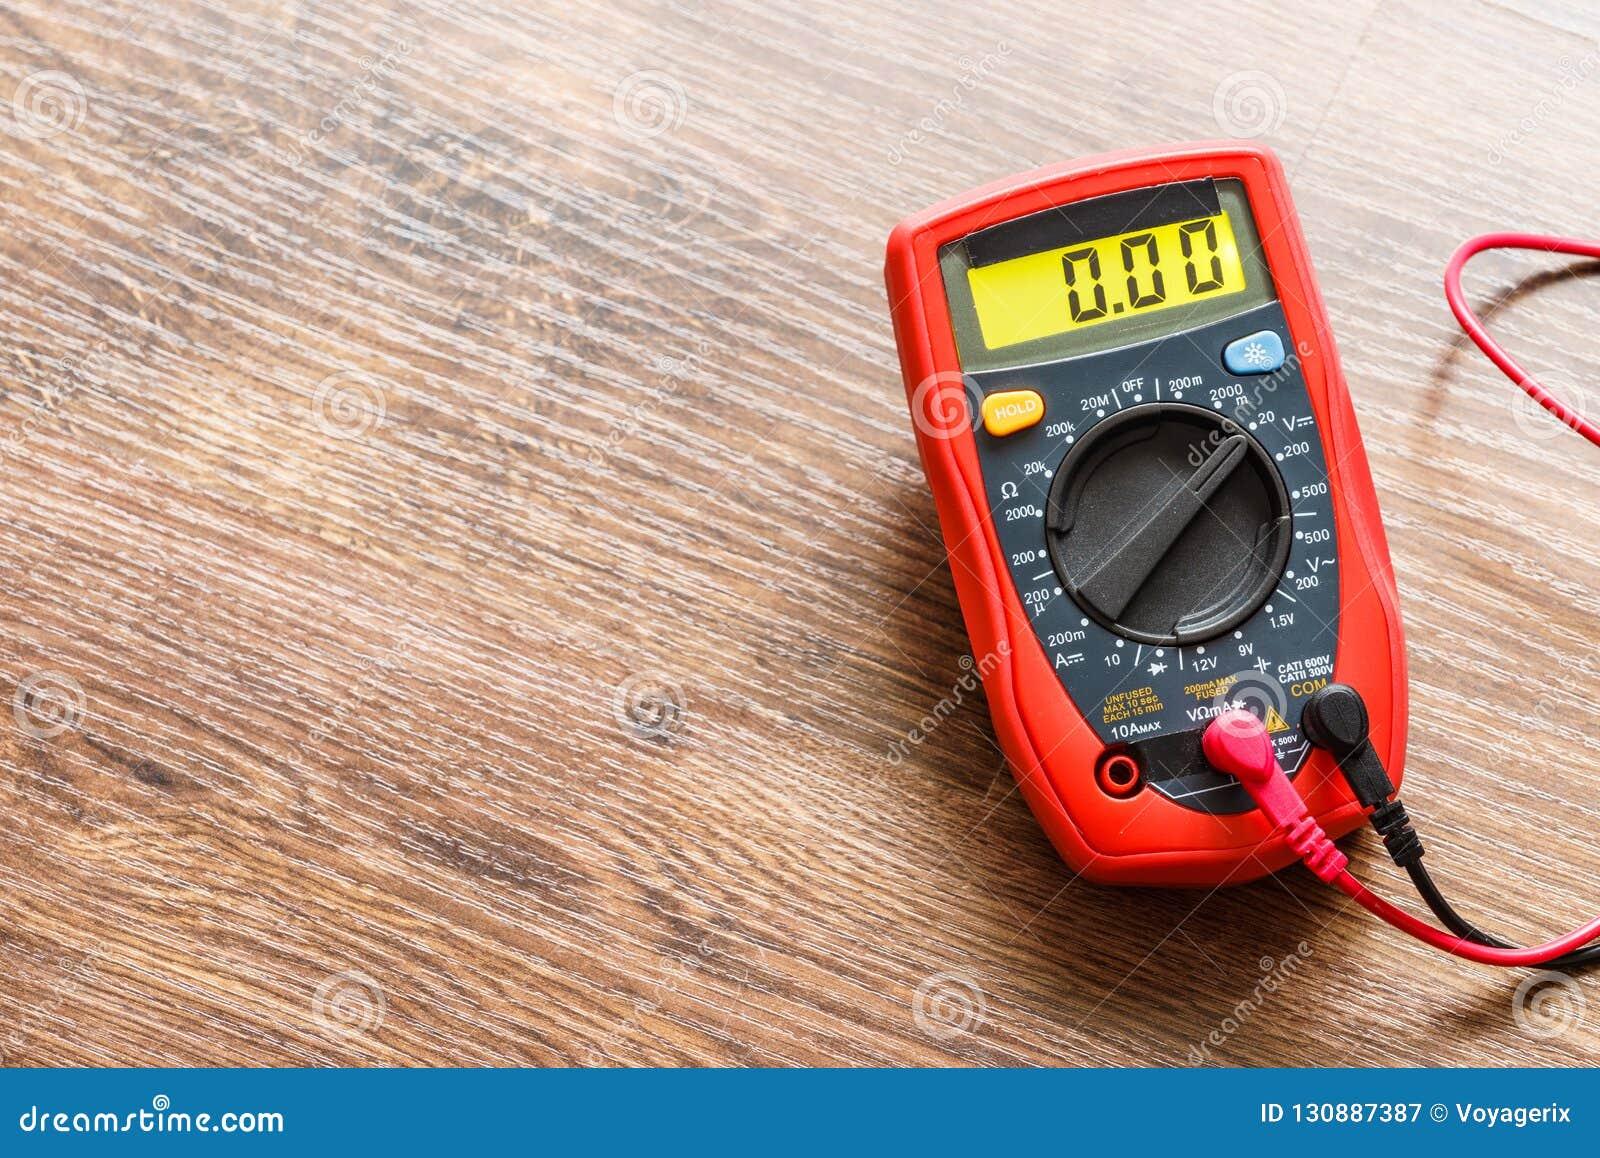 Multimeter for measurement of voltage